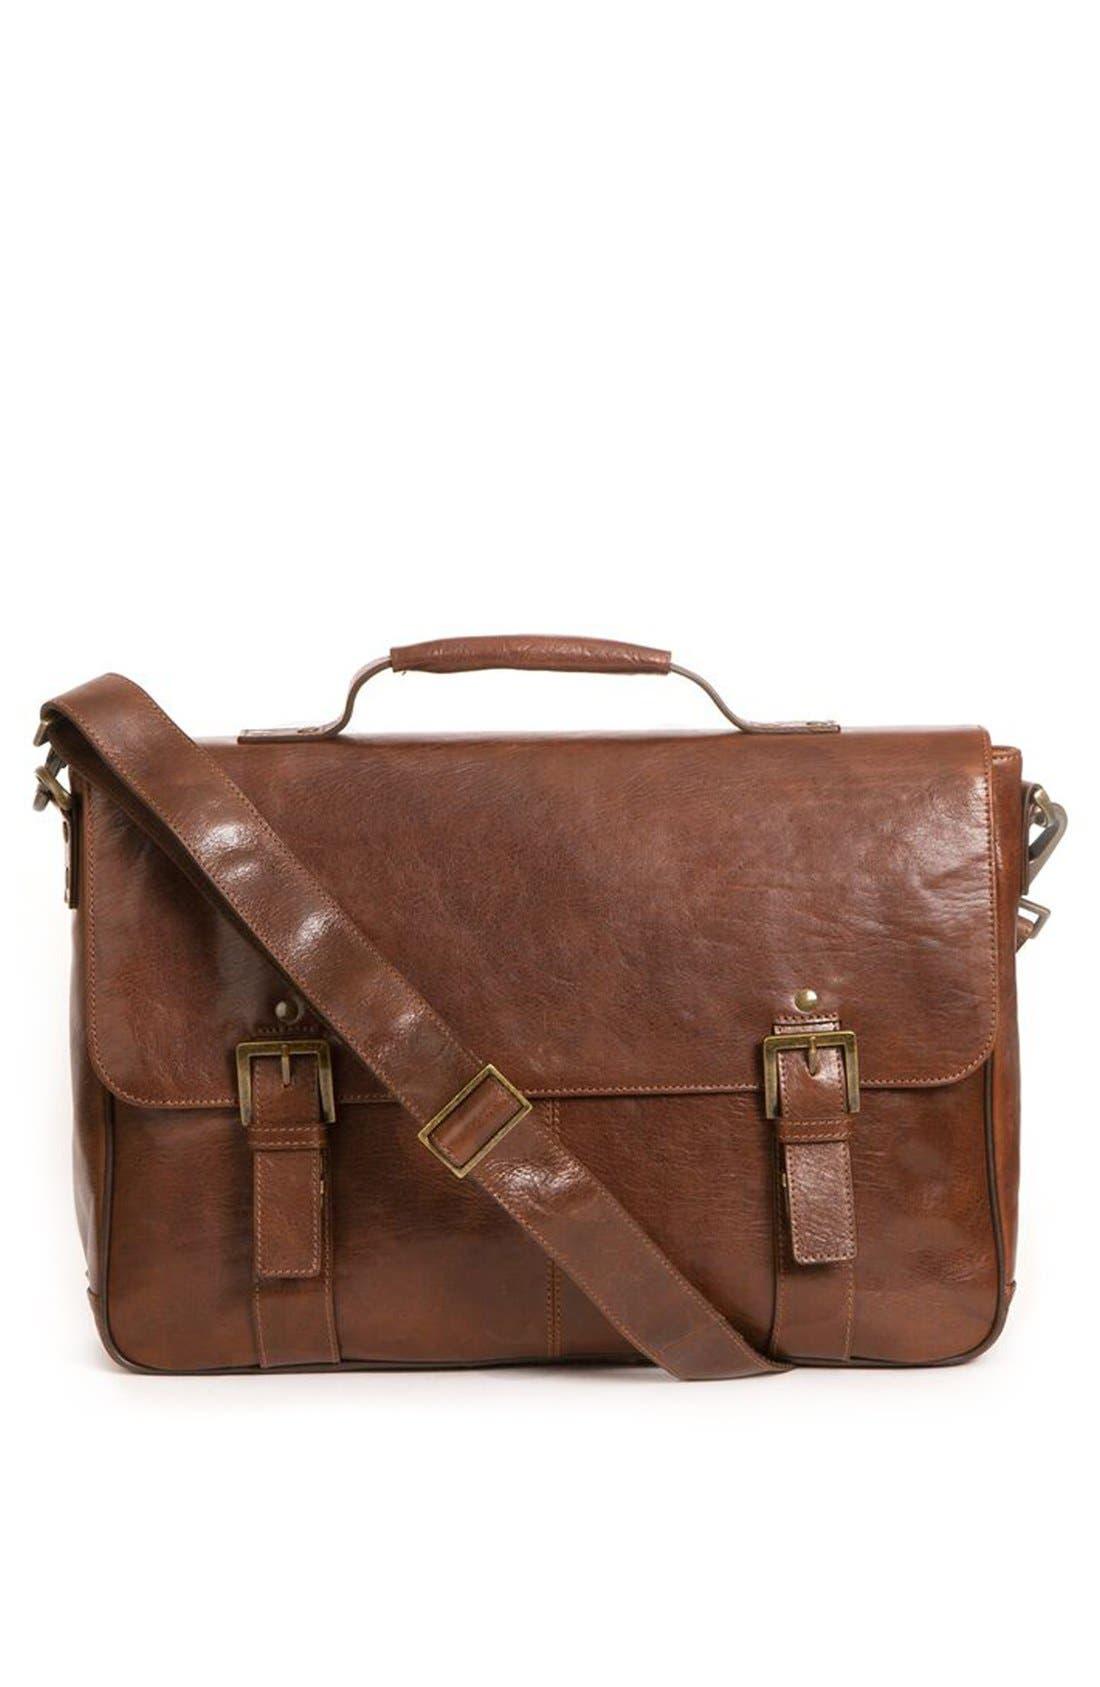 'Becker' Leather Messenger Bag,                             Main thumbnail 1, color,                             Whiskey W/ Khaki